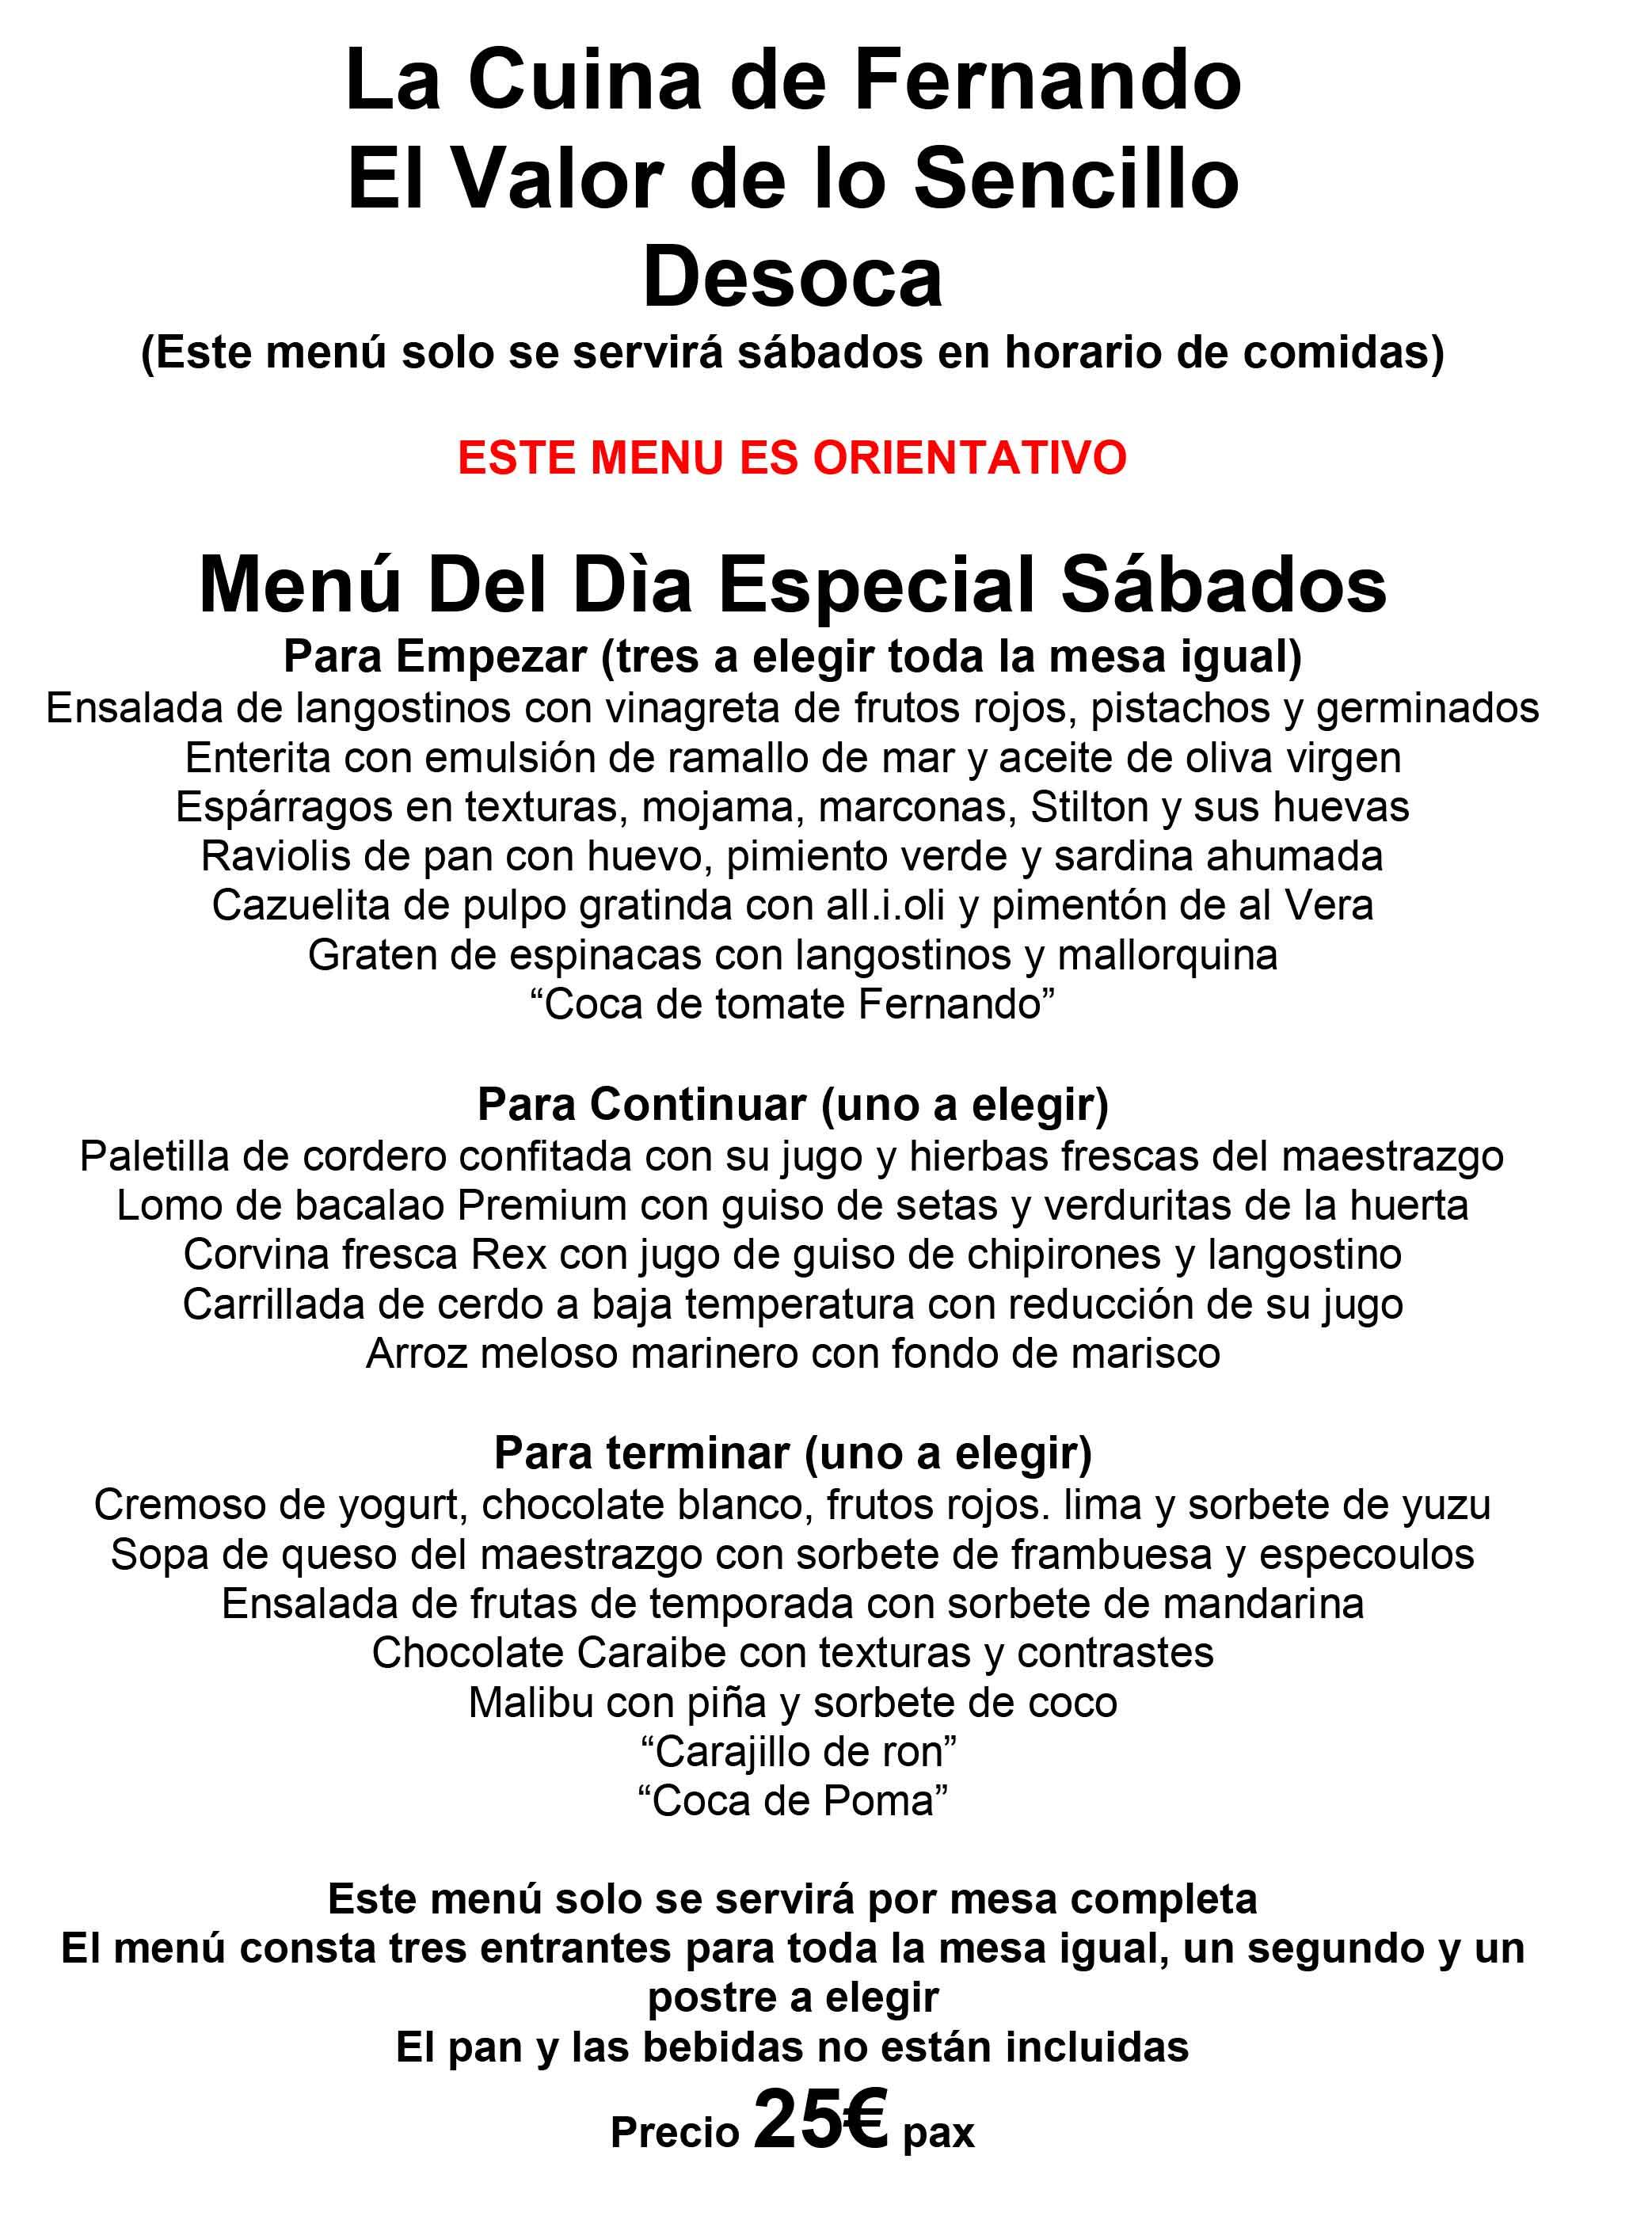 Menú Especial Sábados - La Cuina de Fernando #Desoca